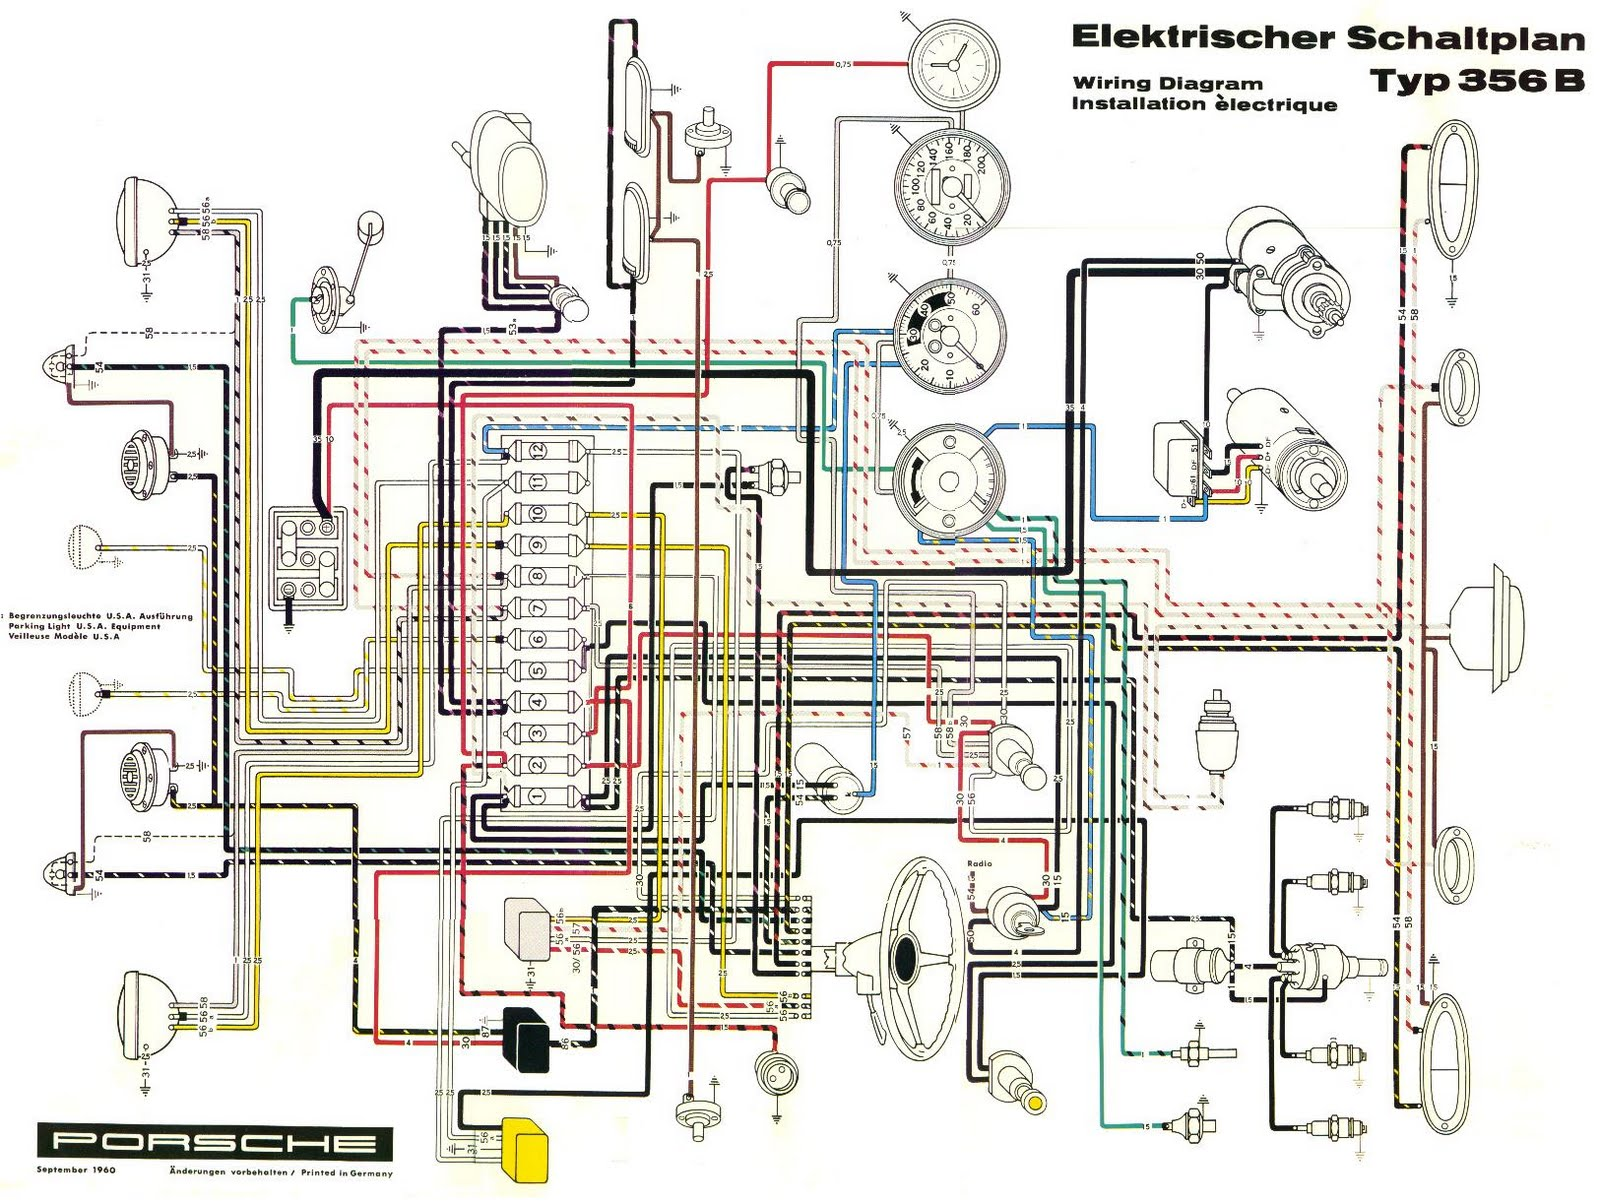 1972 porsche 911 wiring harness wiring diagram blog Wiring Schematics 1972 porsche 911 wiring harness data wiring diagram today porsche 356 wiring harness 1972 porsche 911 wiring harness